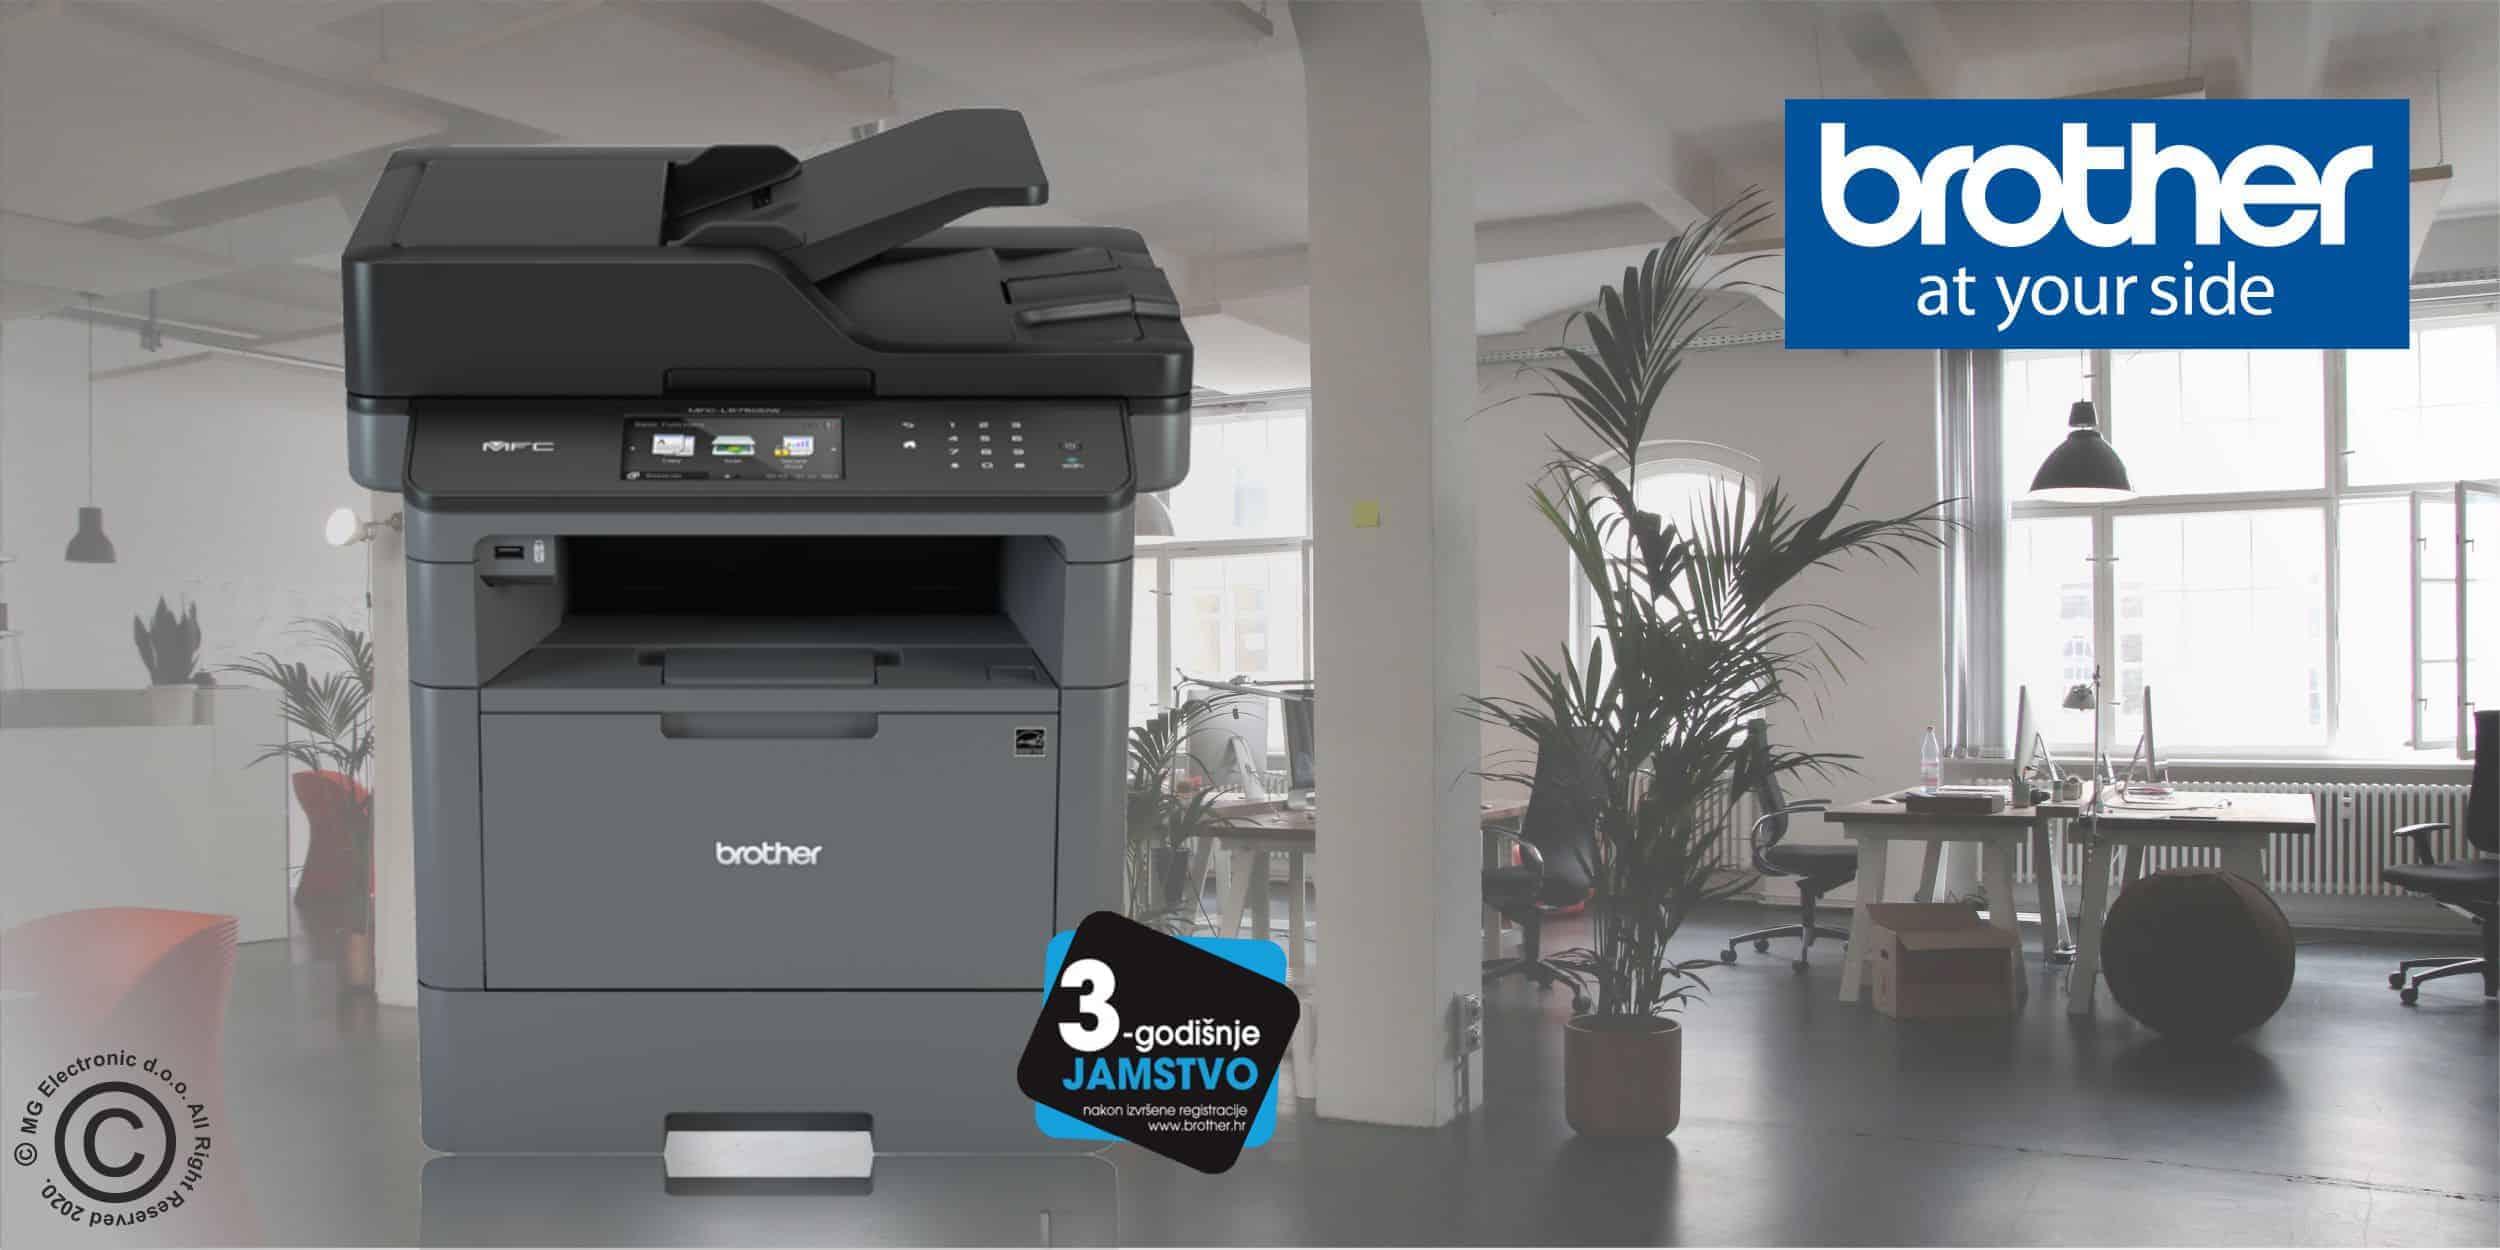 Brother Laserski printeri i višenamjenski uređaji © All Rights Reserved M.G. Electronic d.o.o. 2020.